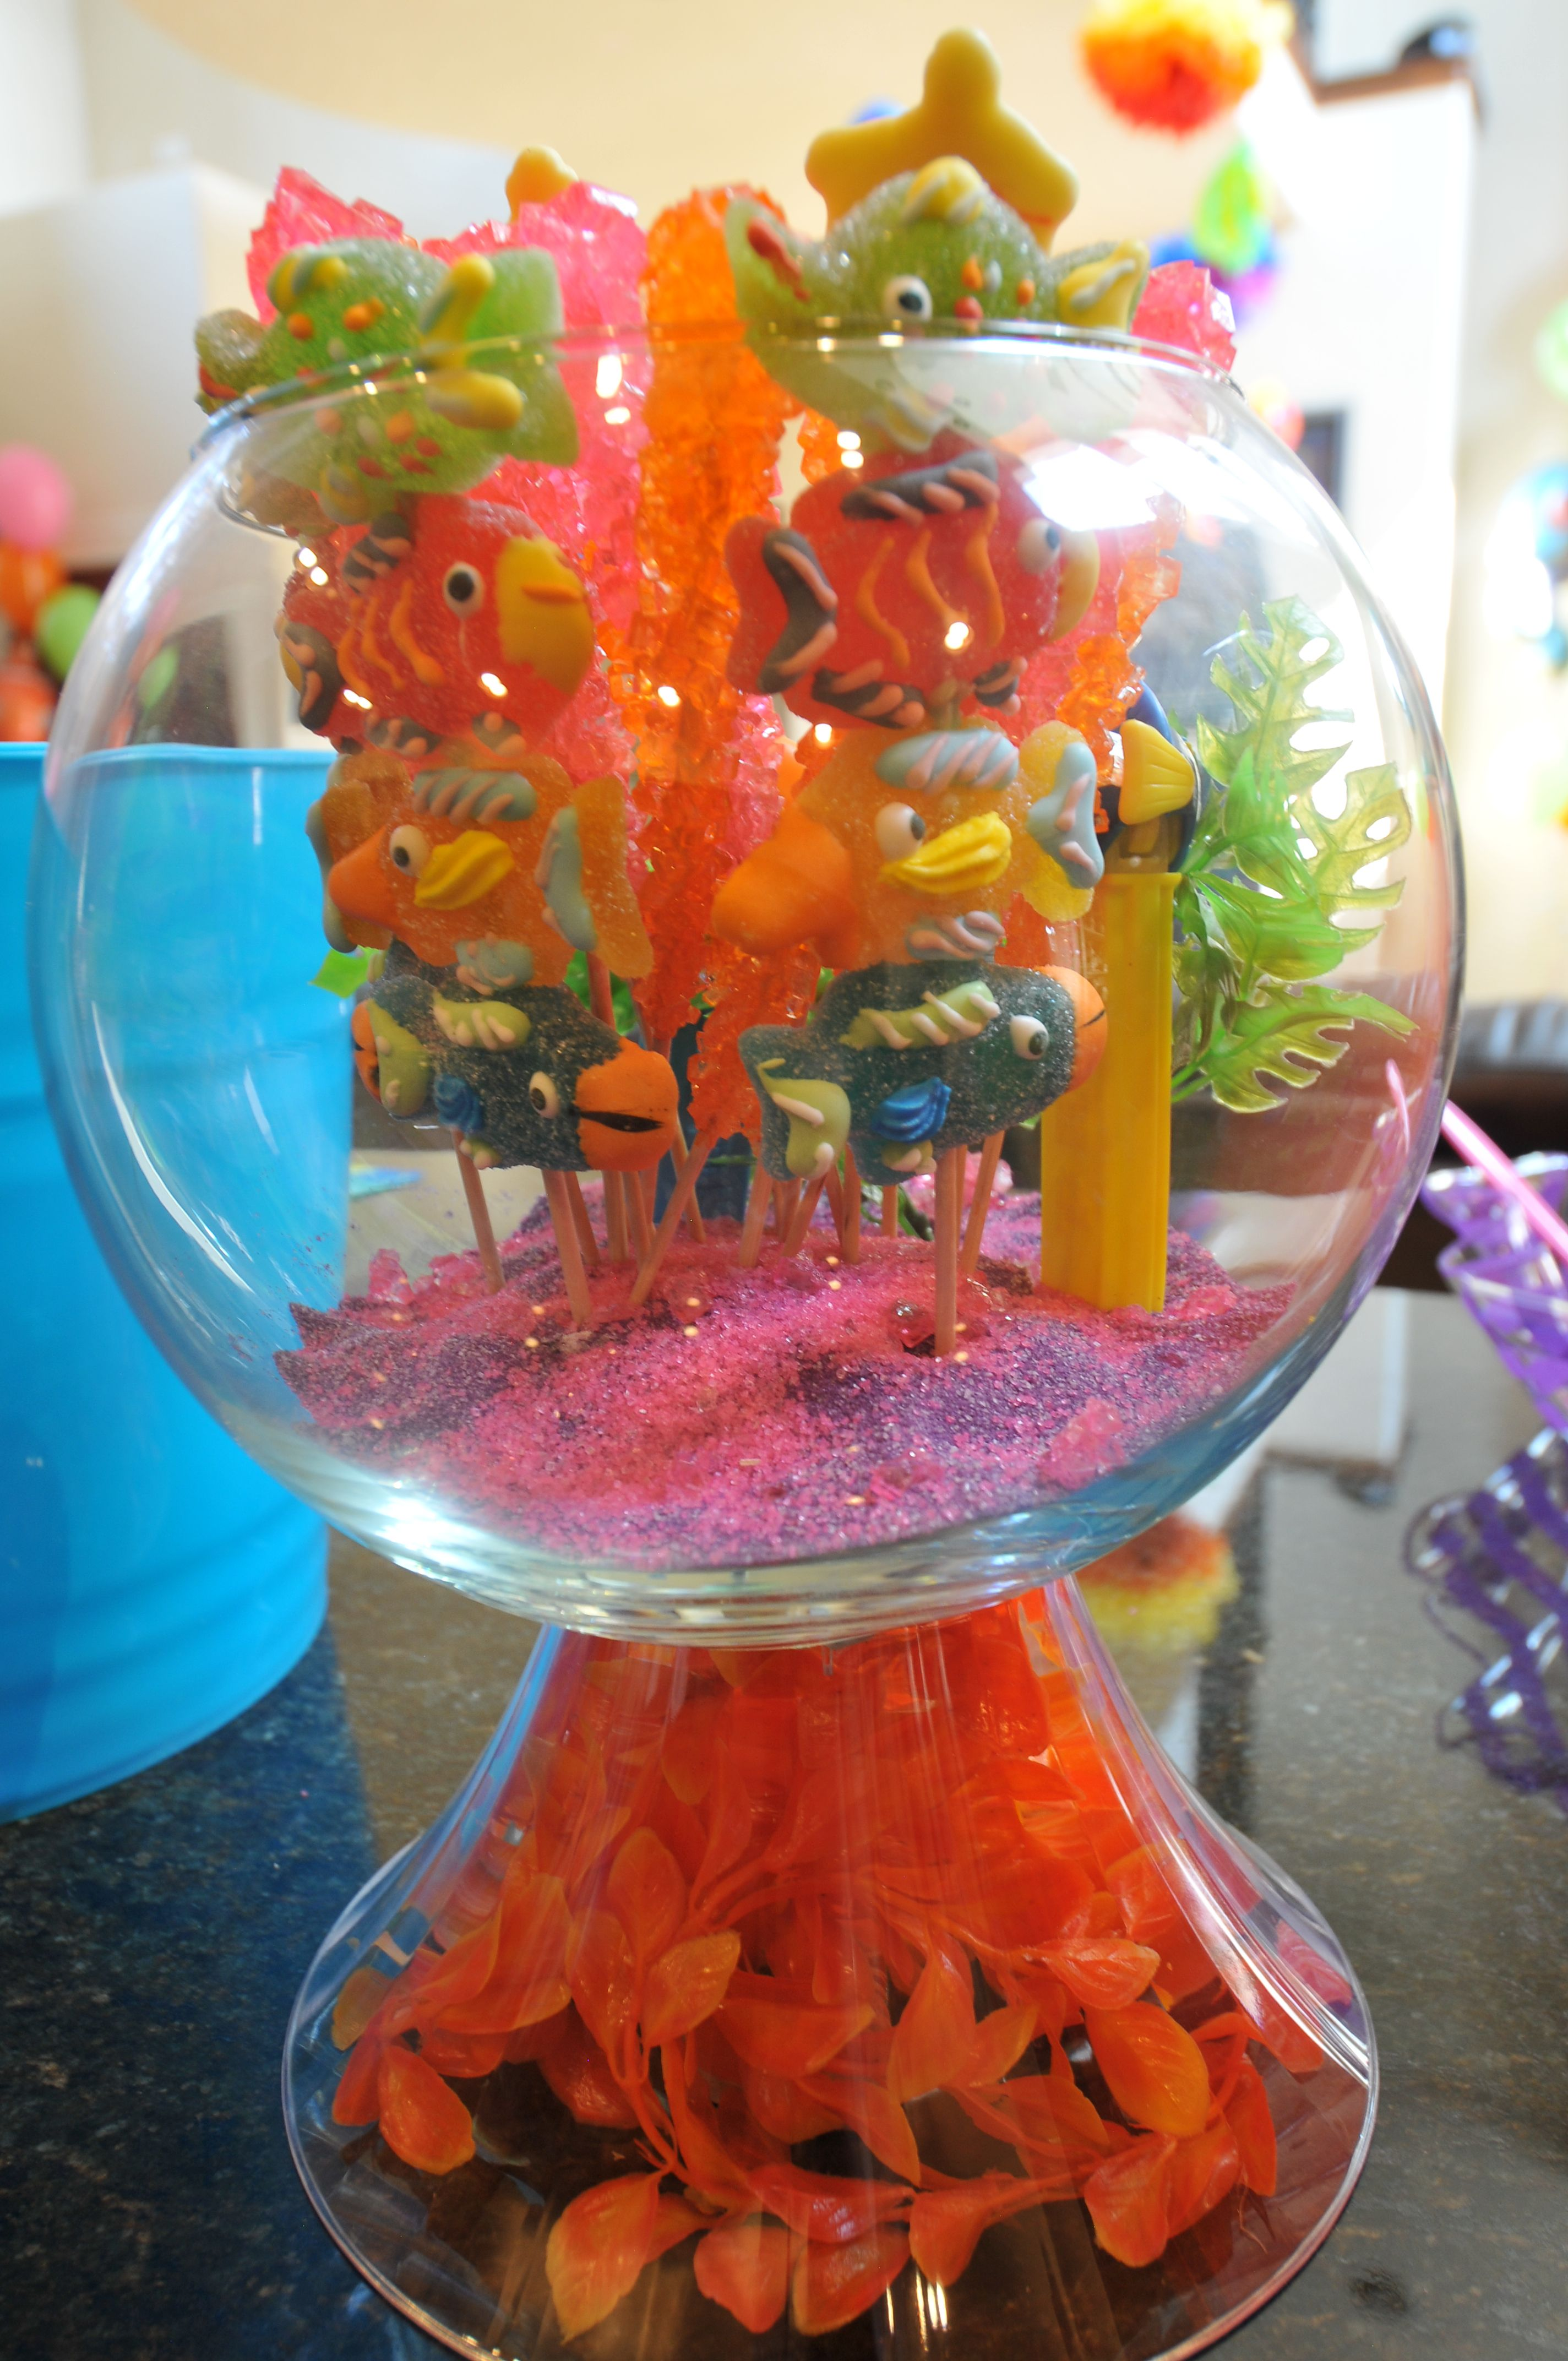 Finding Nemo Baby Shower Fish Bowl decoration | Disney Finding Nemo ...